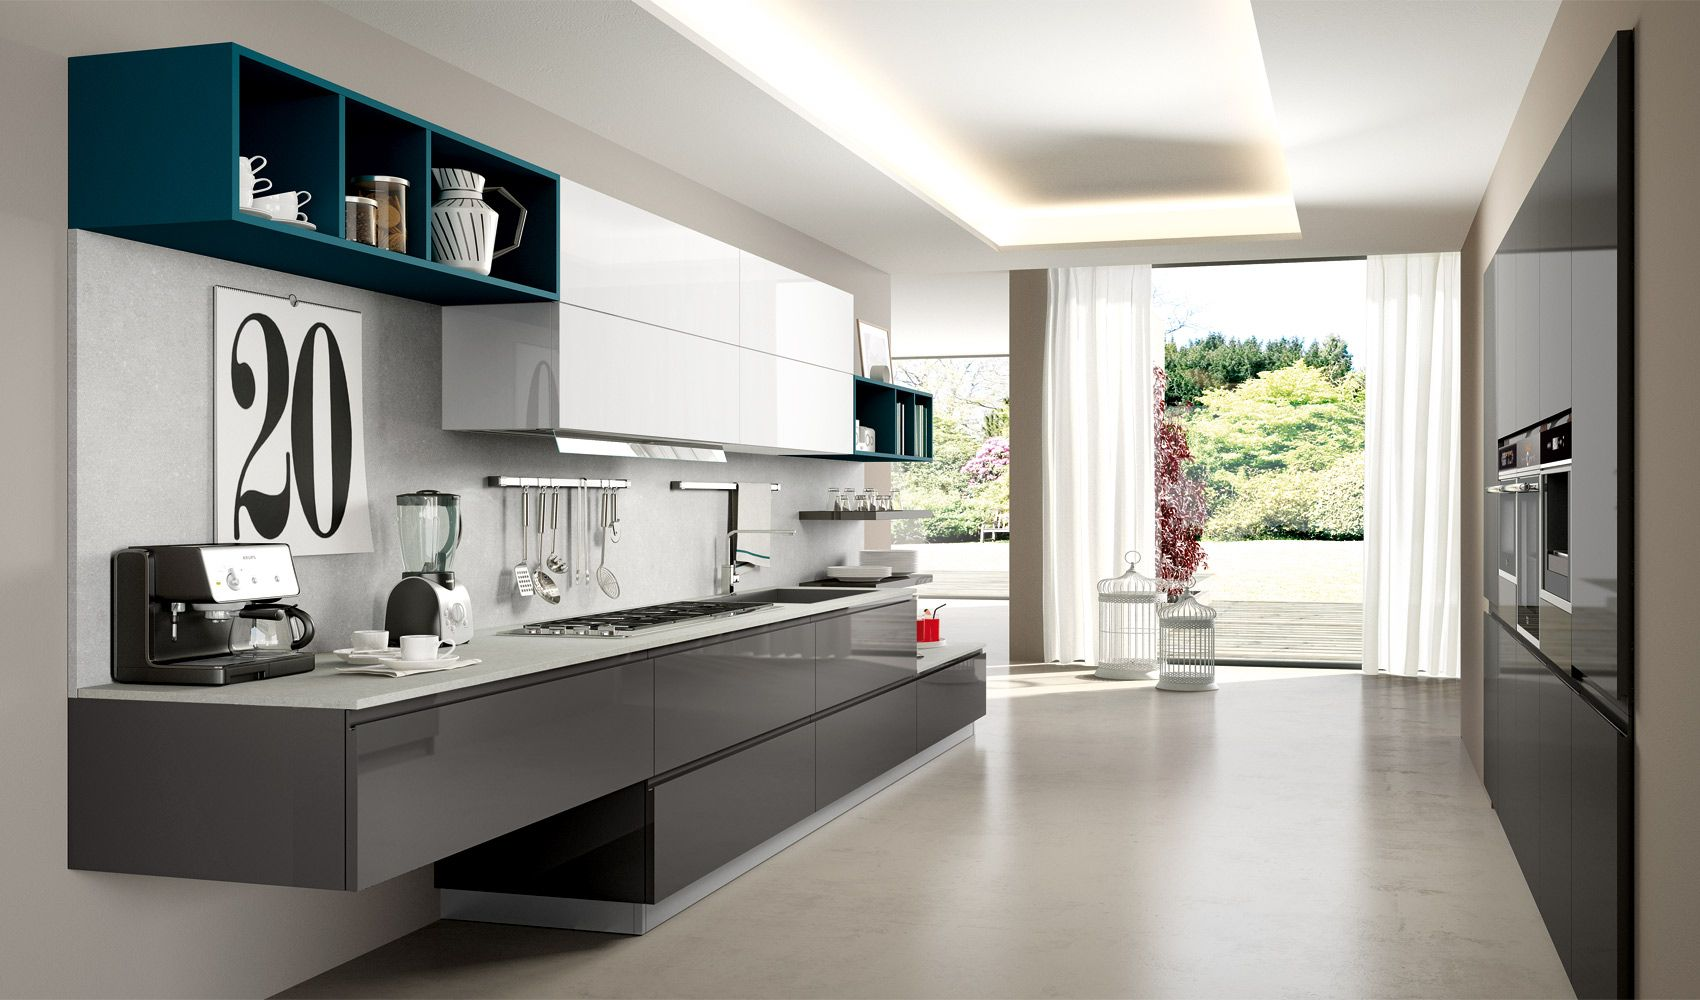 Pin by Arredo3 on Cucine Moderne - Wega | Pinterest | Kitchen ...